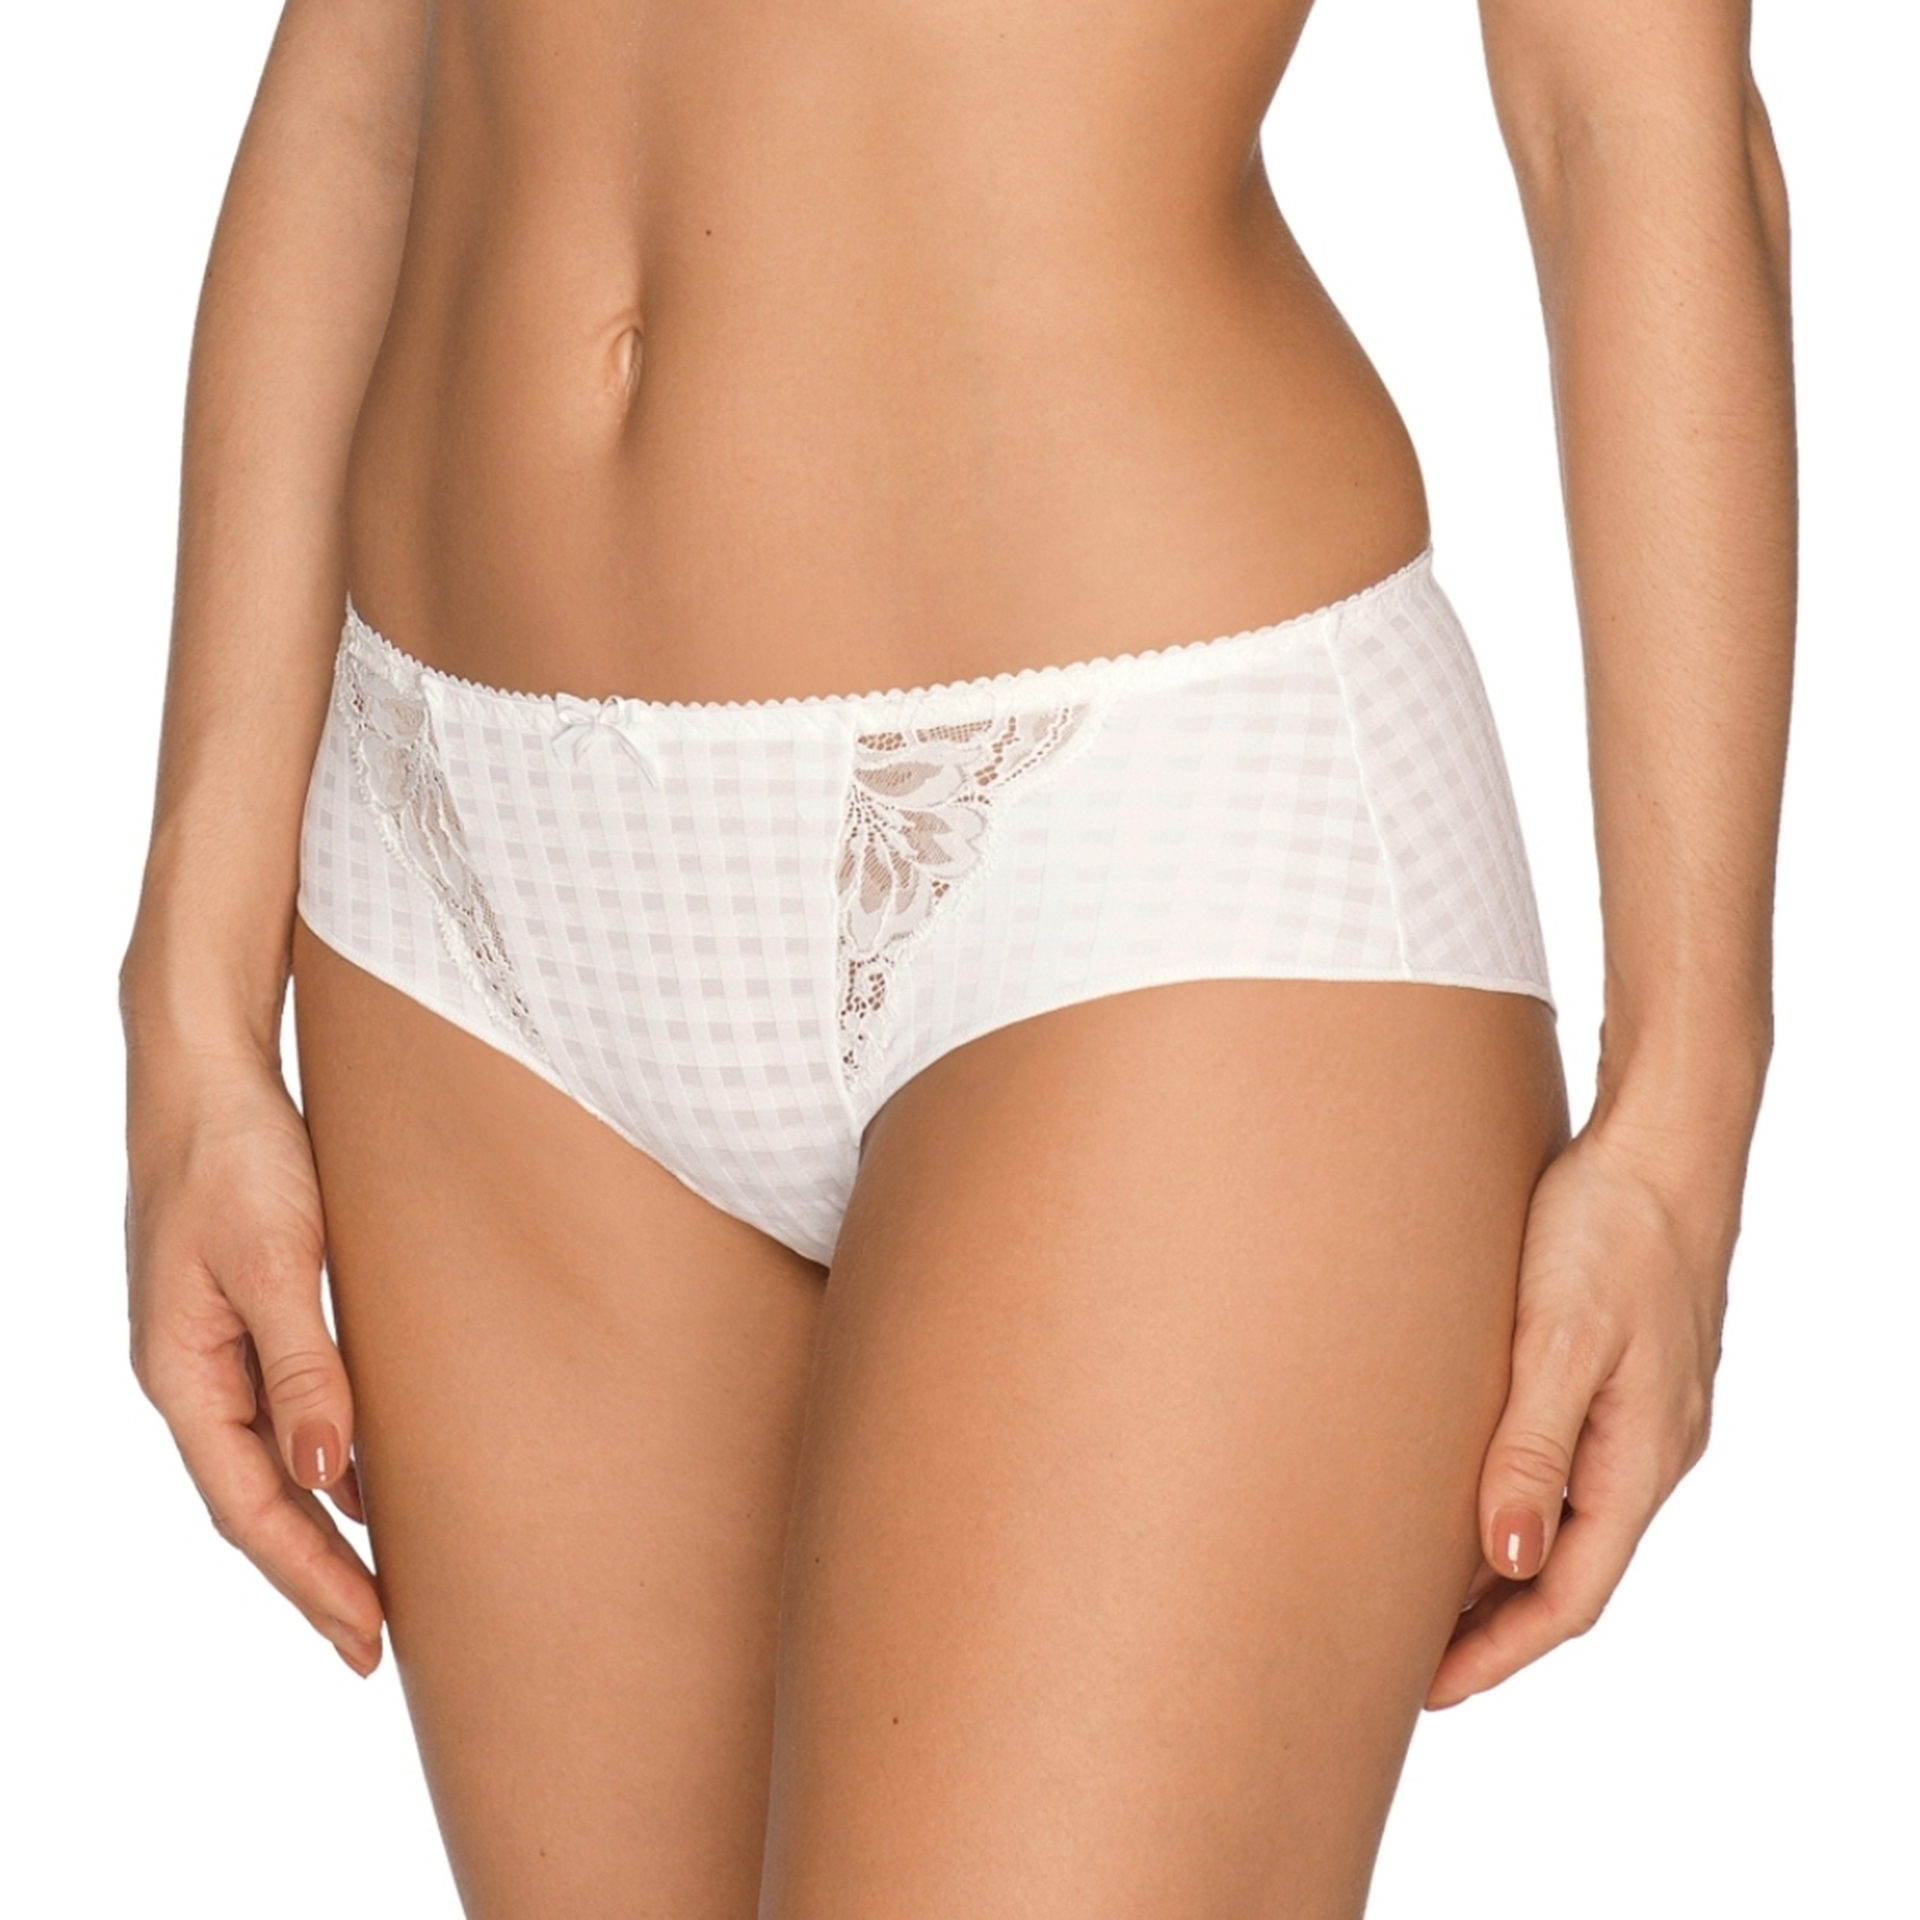 PrimaDonna-Madison, Panty, Hotpants